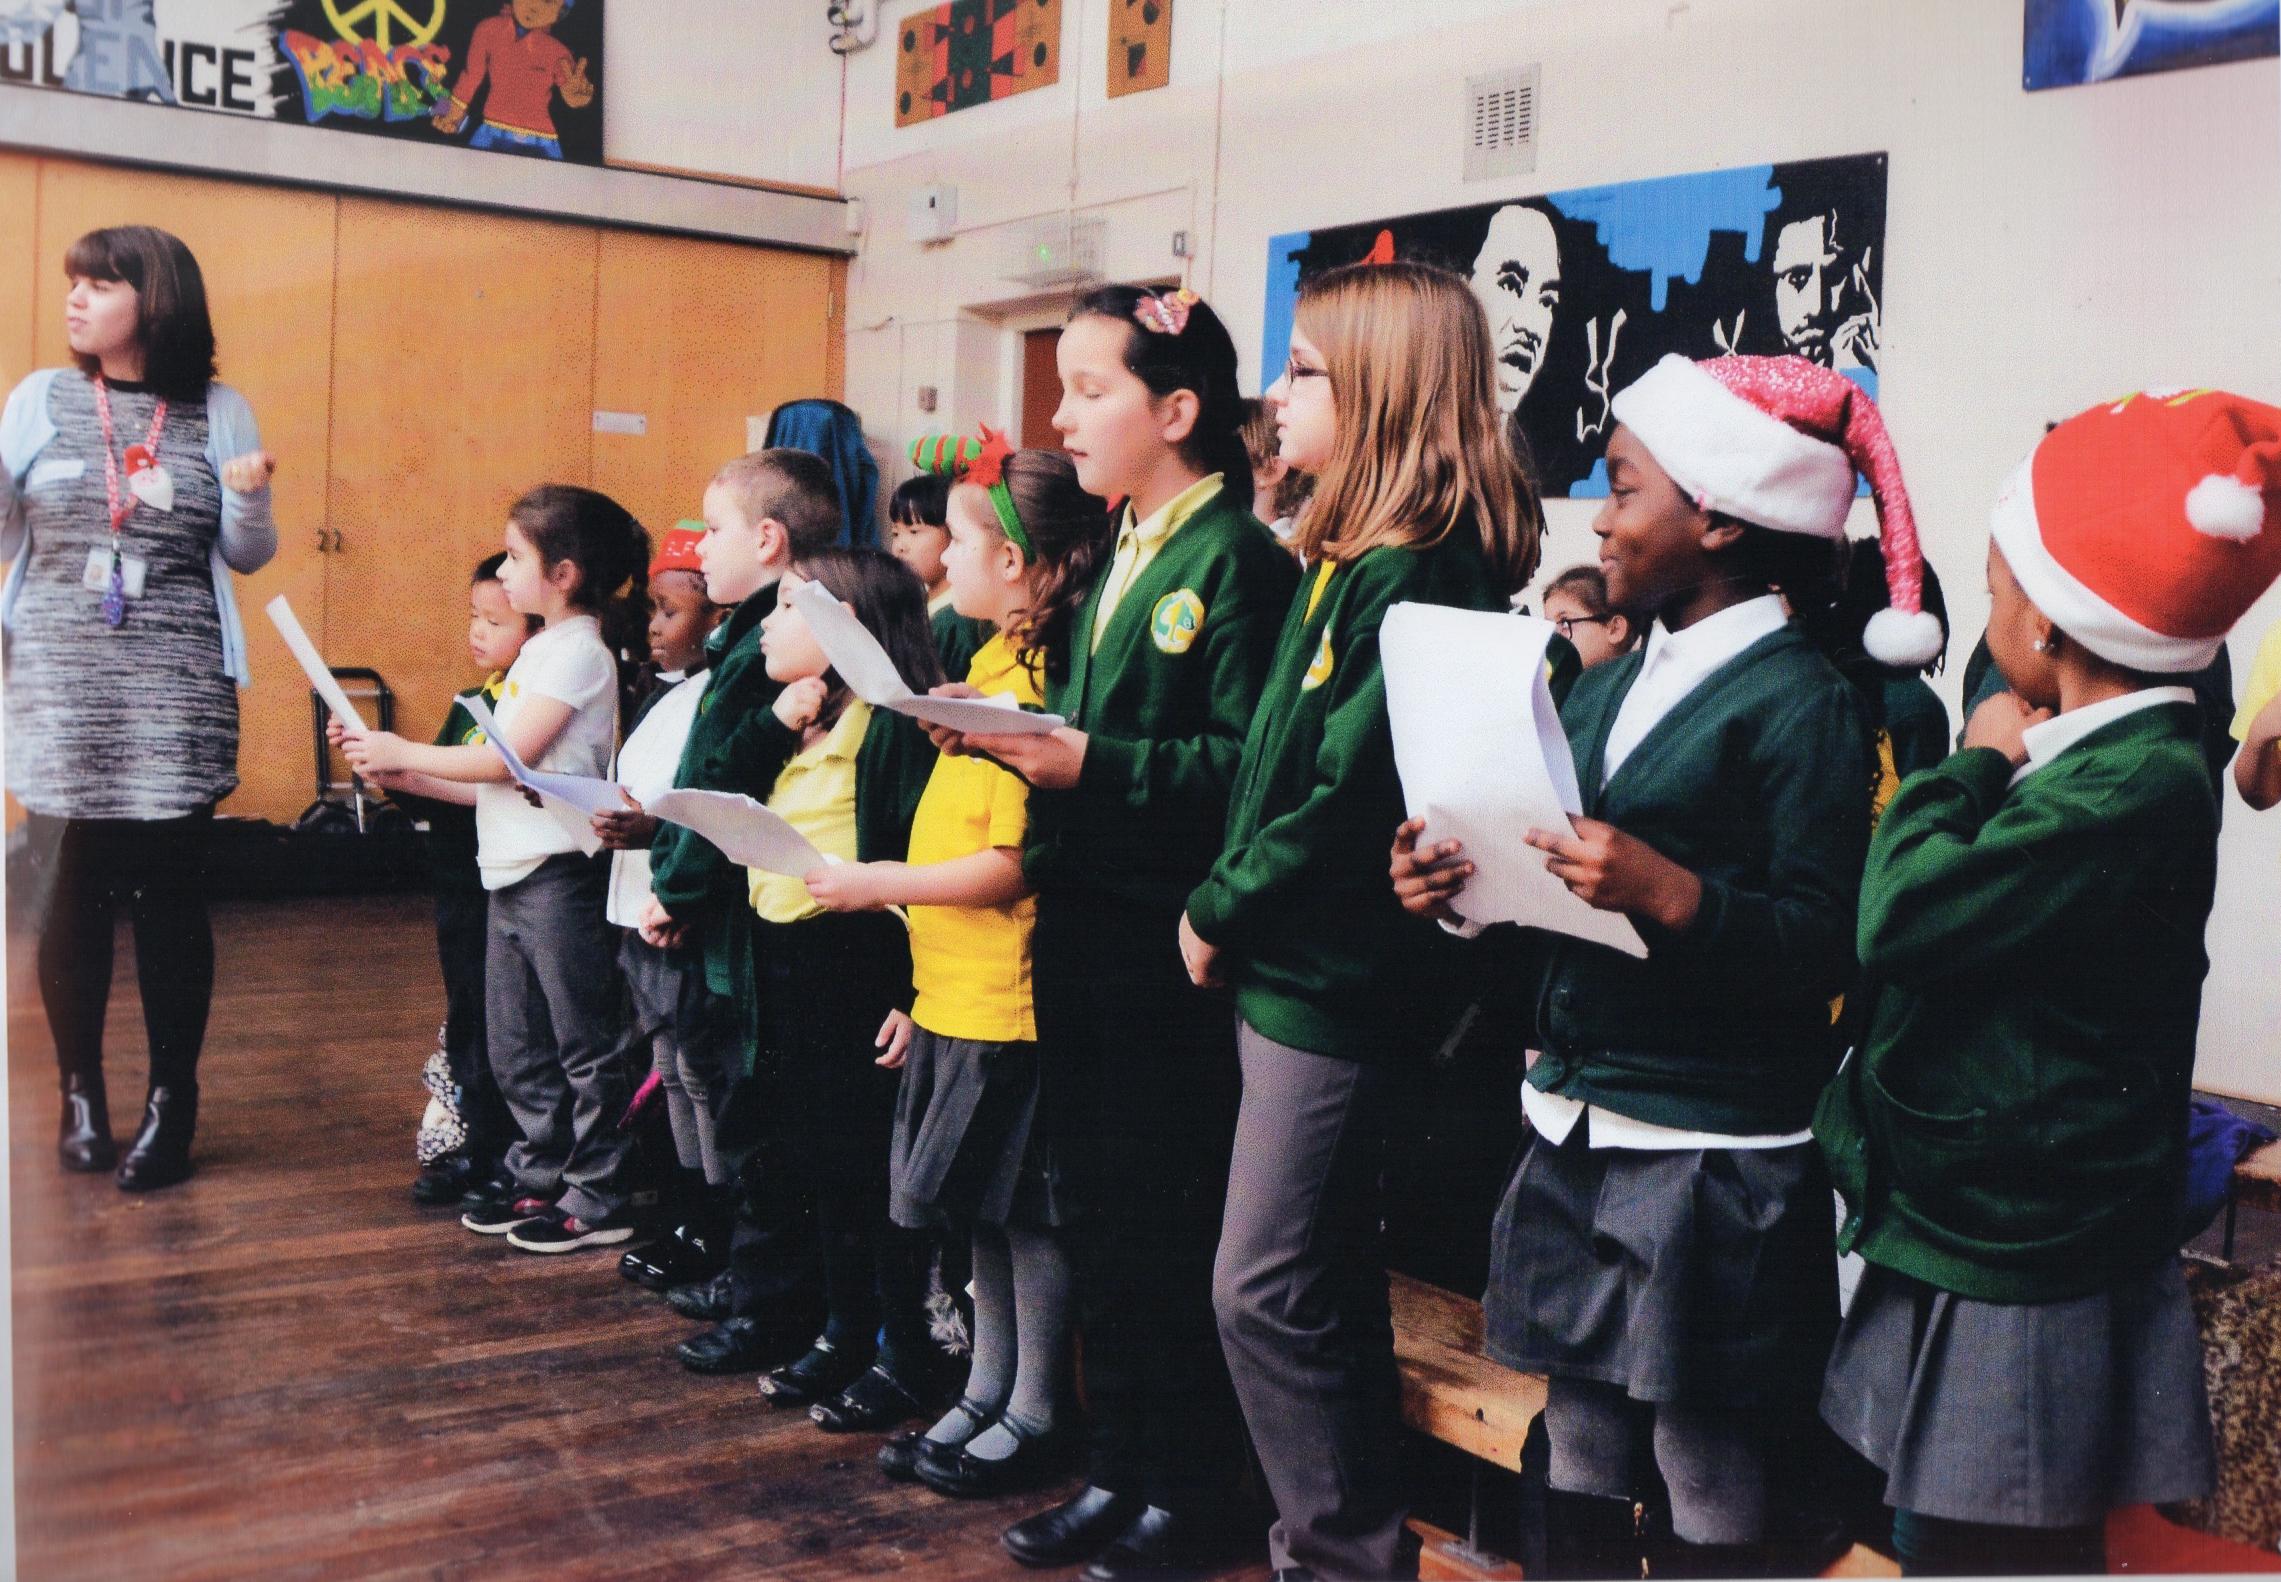 ADFS Christmas Singalong 2018 featuring the choir from Burnt Oak school.